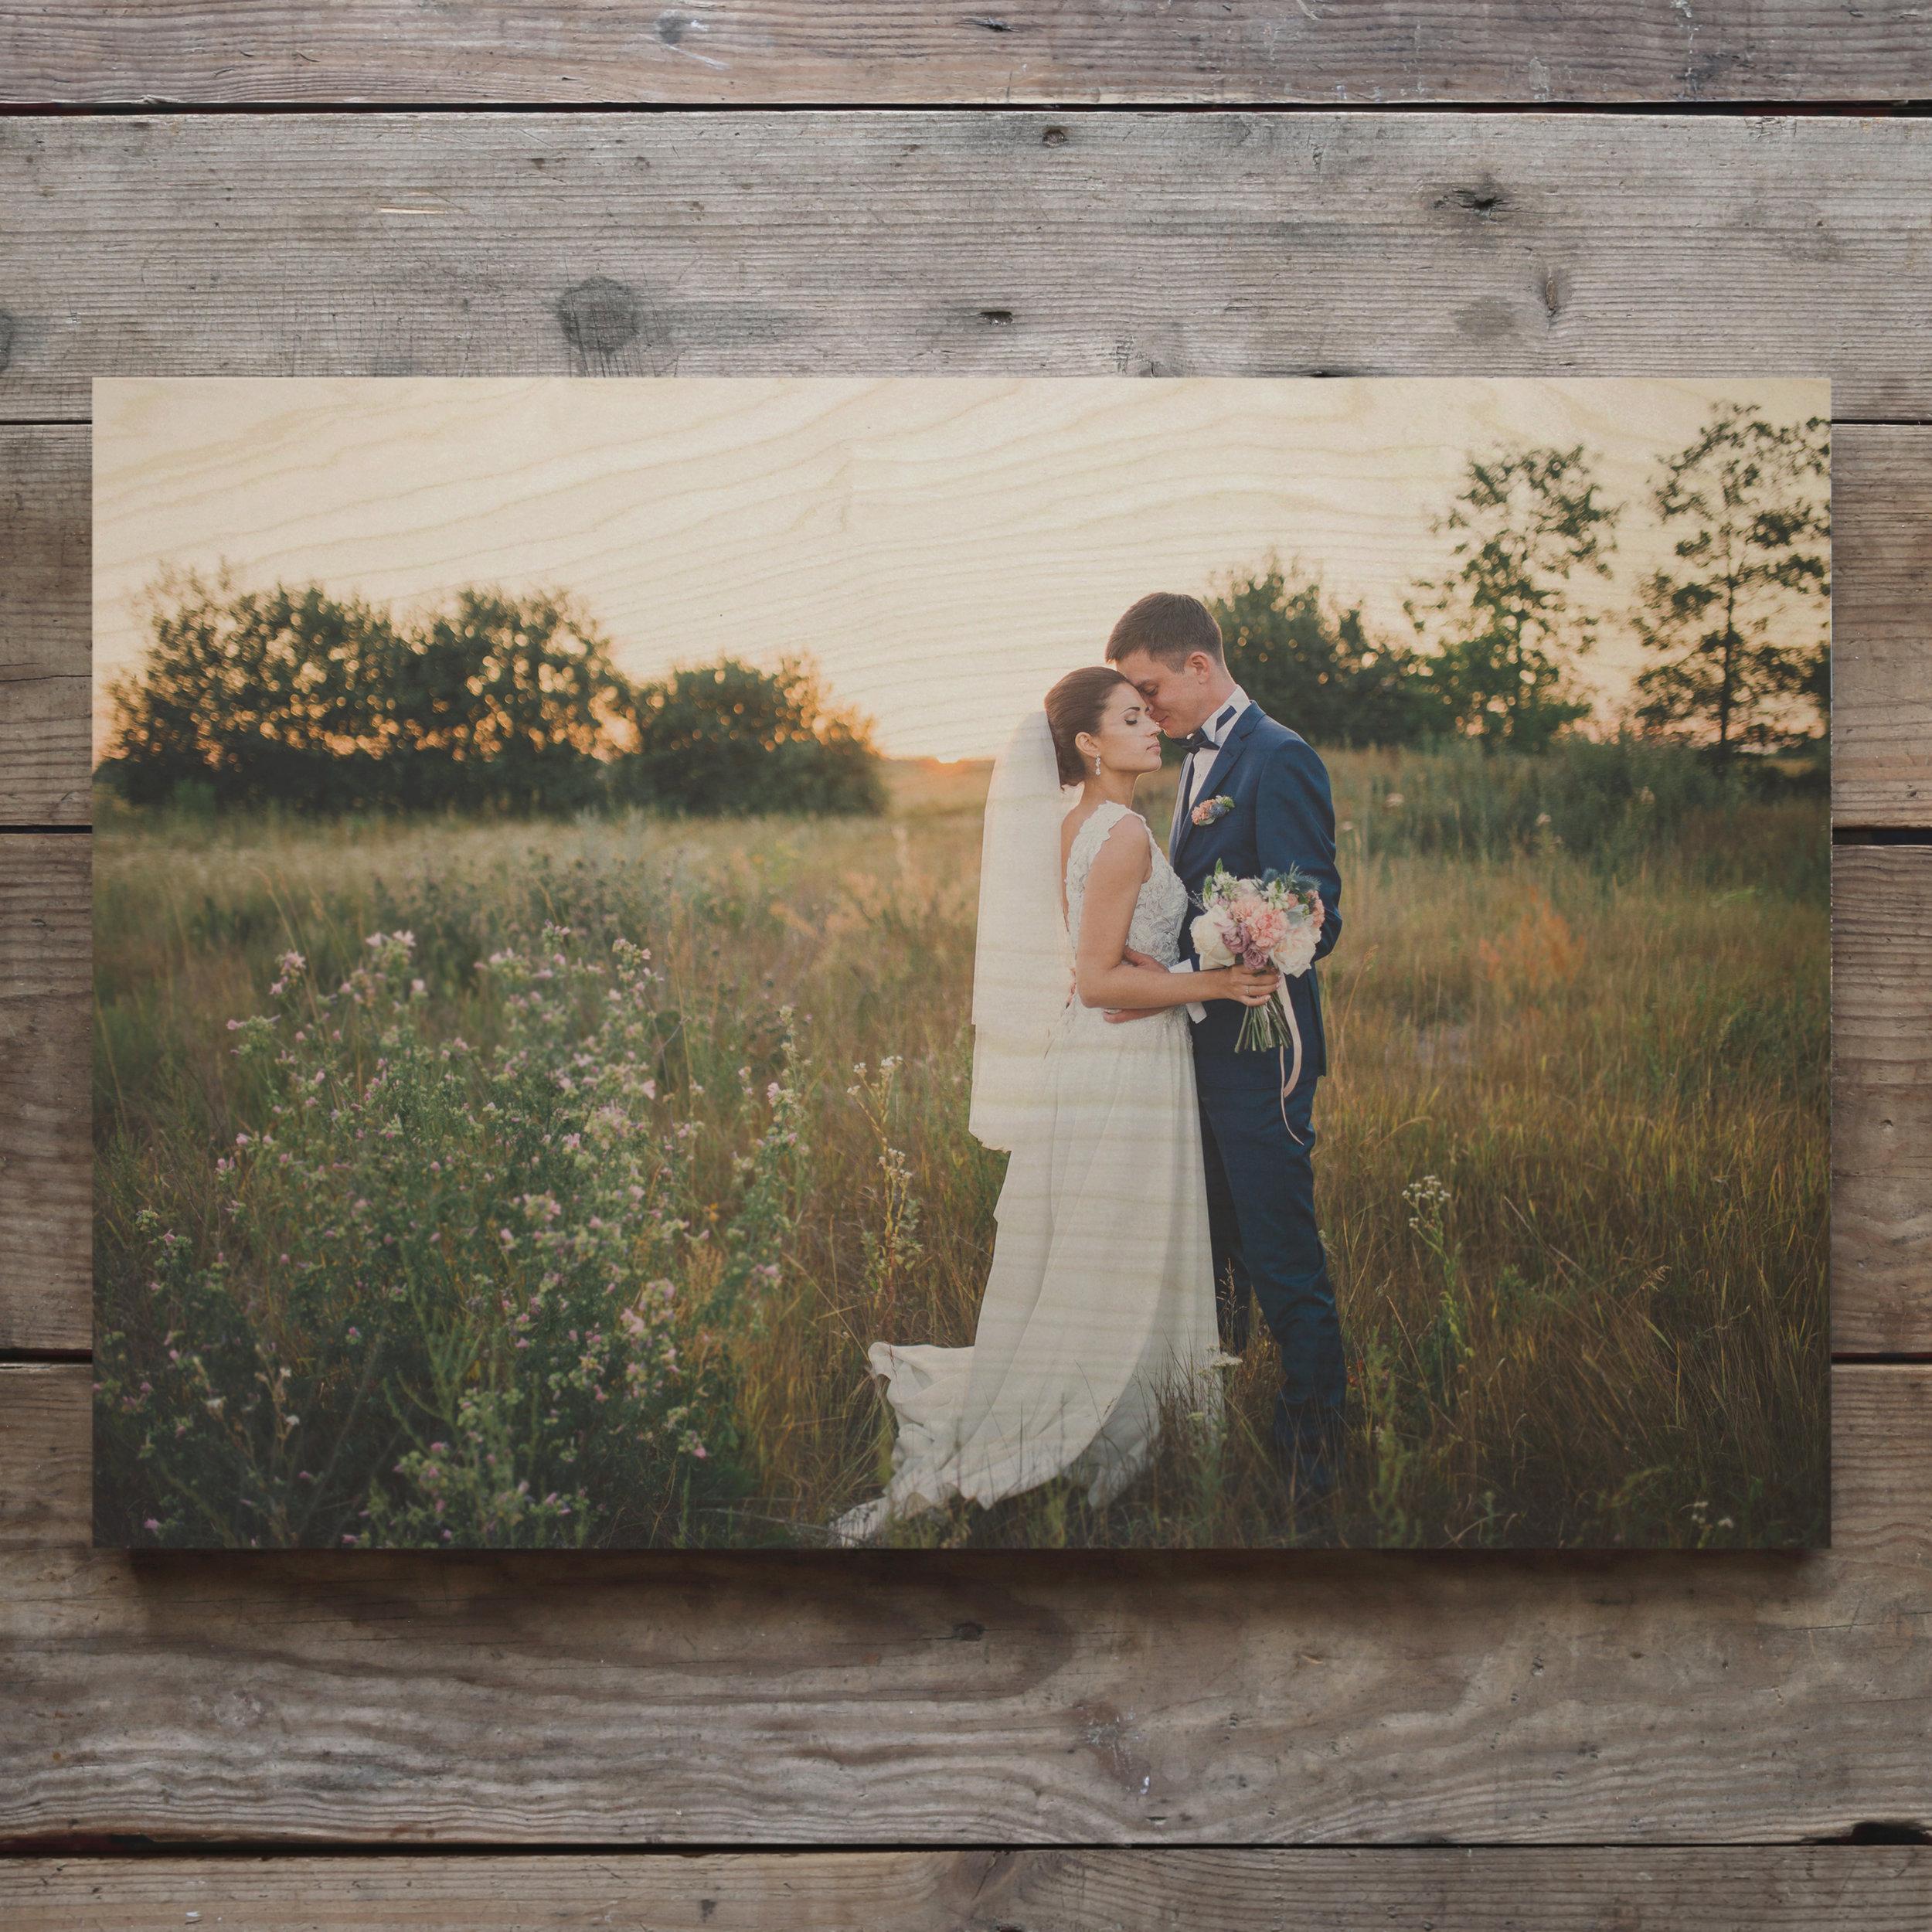 wedding on wood.jpg